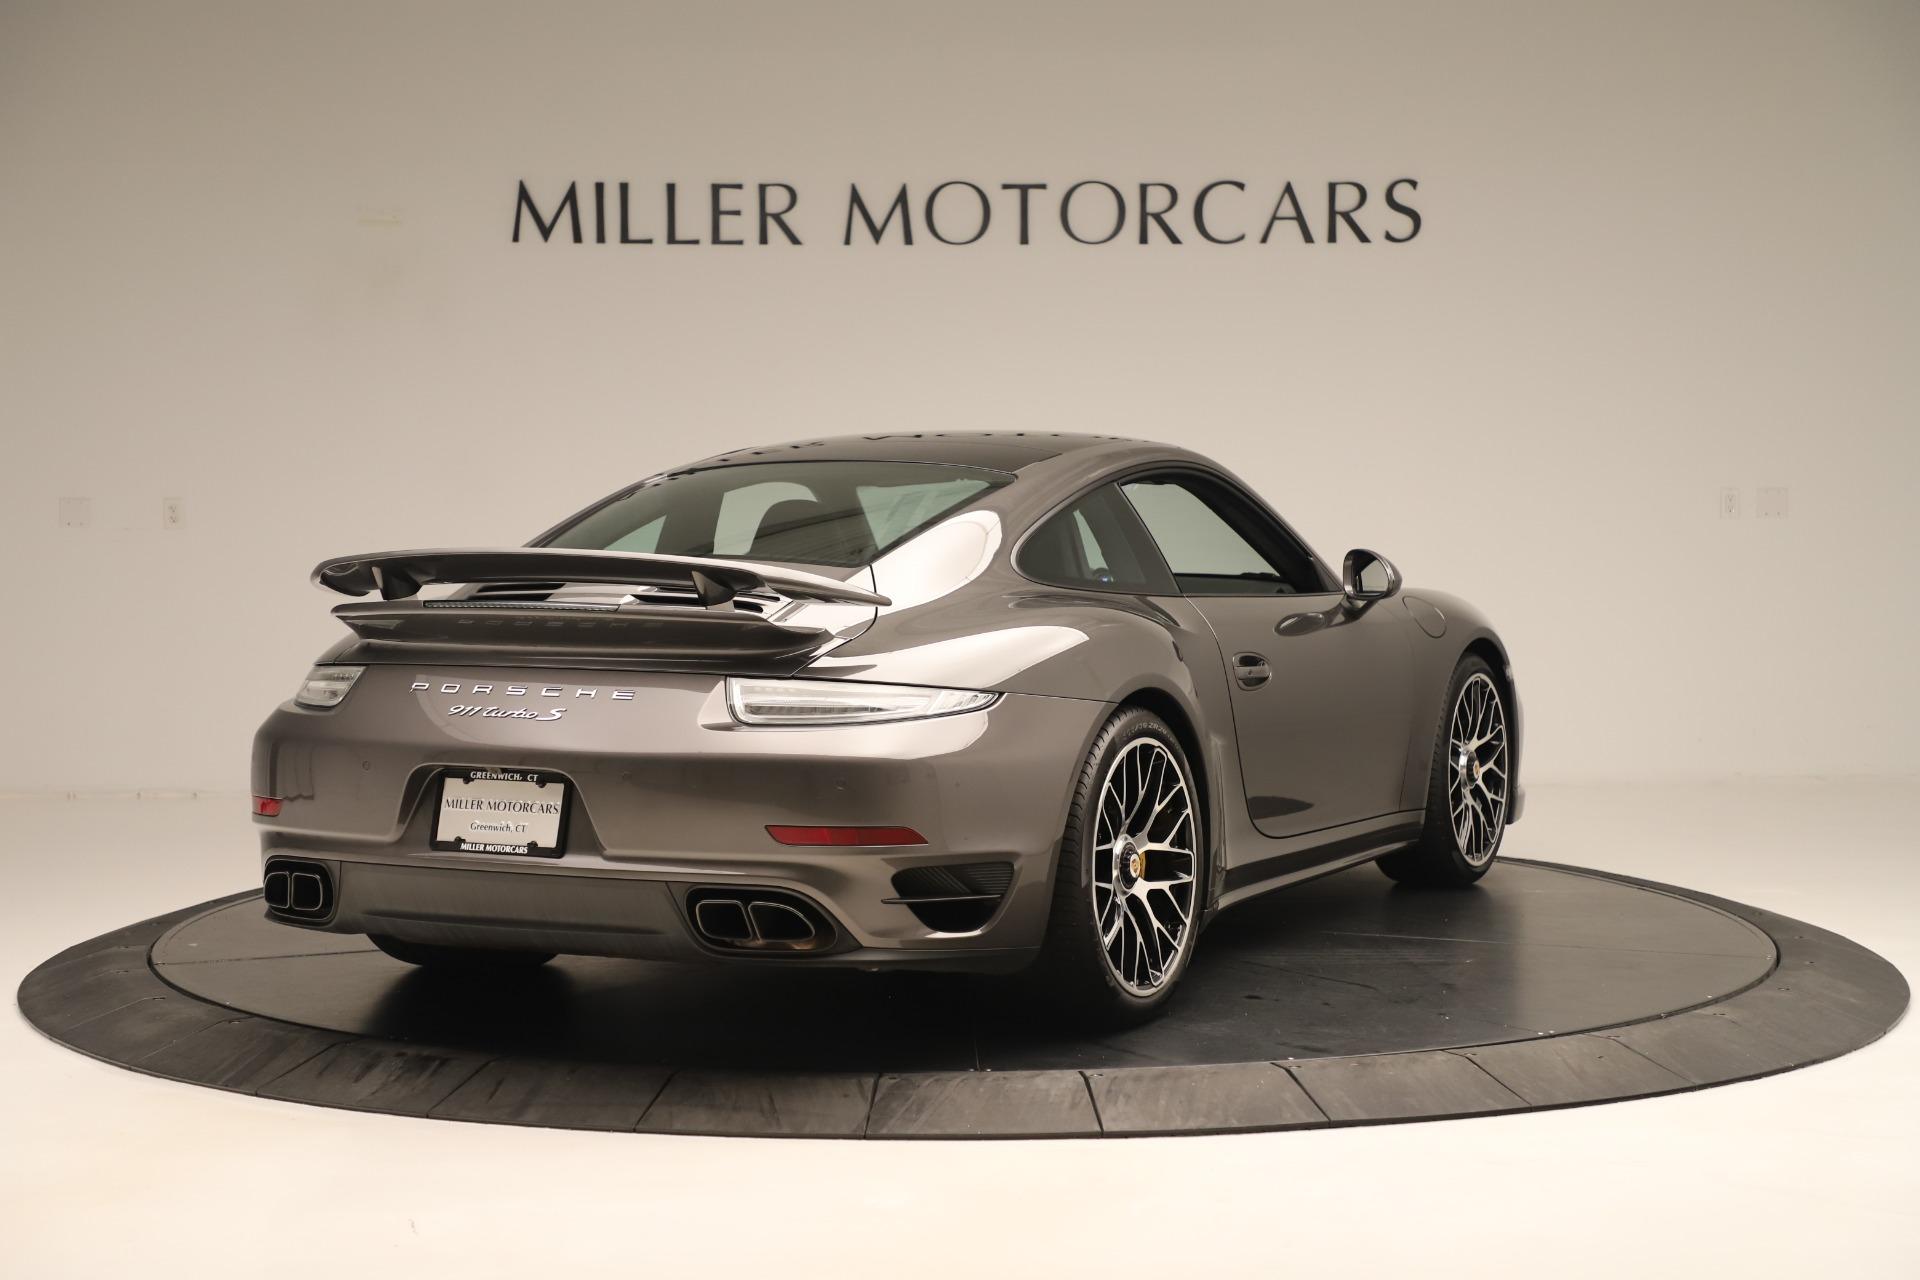 Used 2015 Porsche 911 Turbo S For Sale In Greenwich, CT 3429_p7